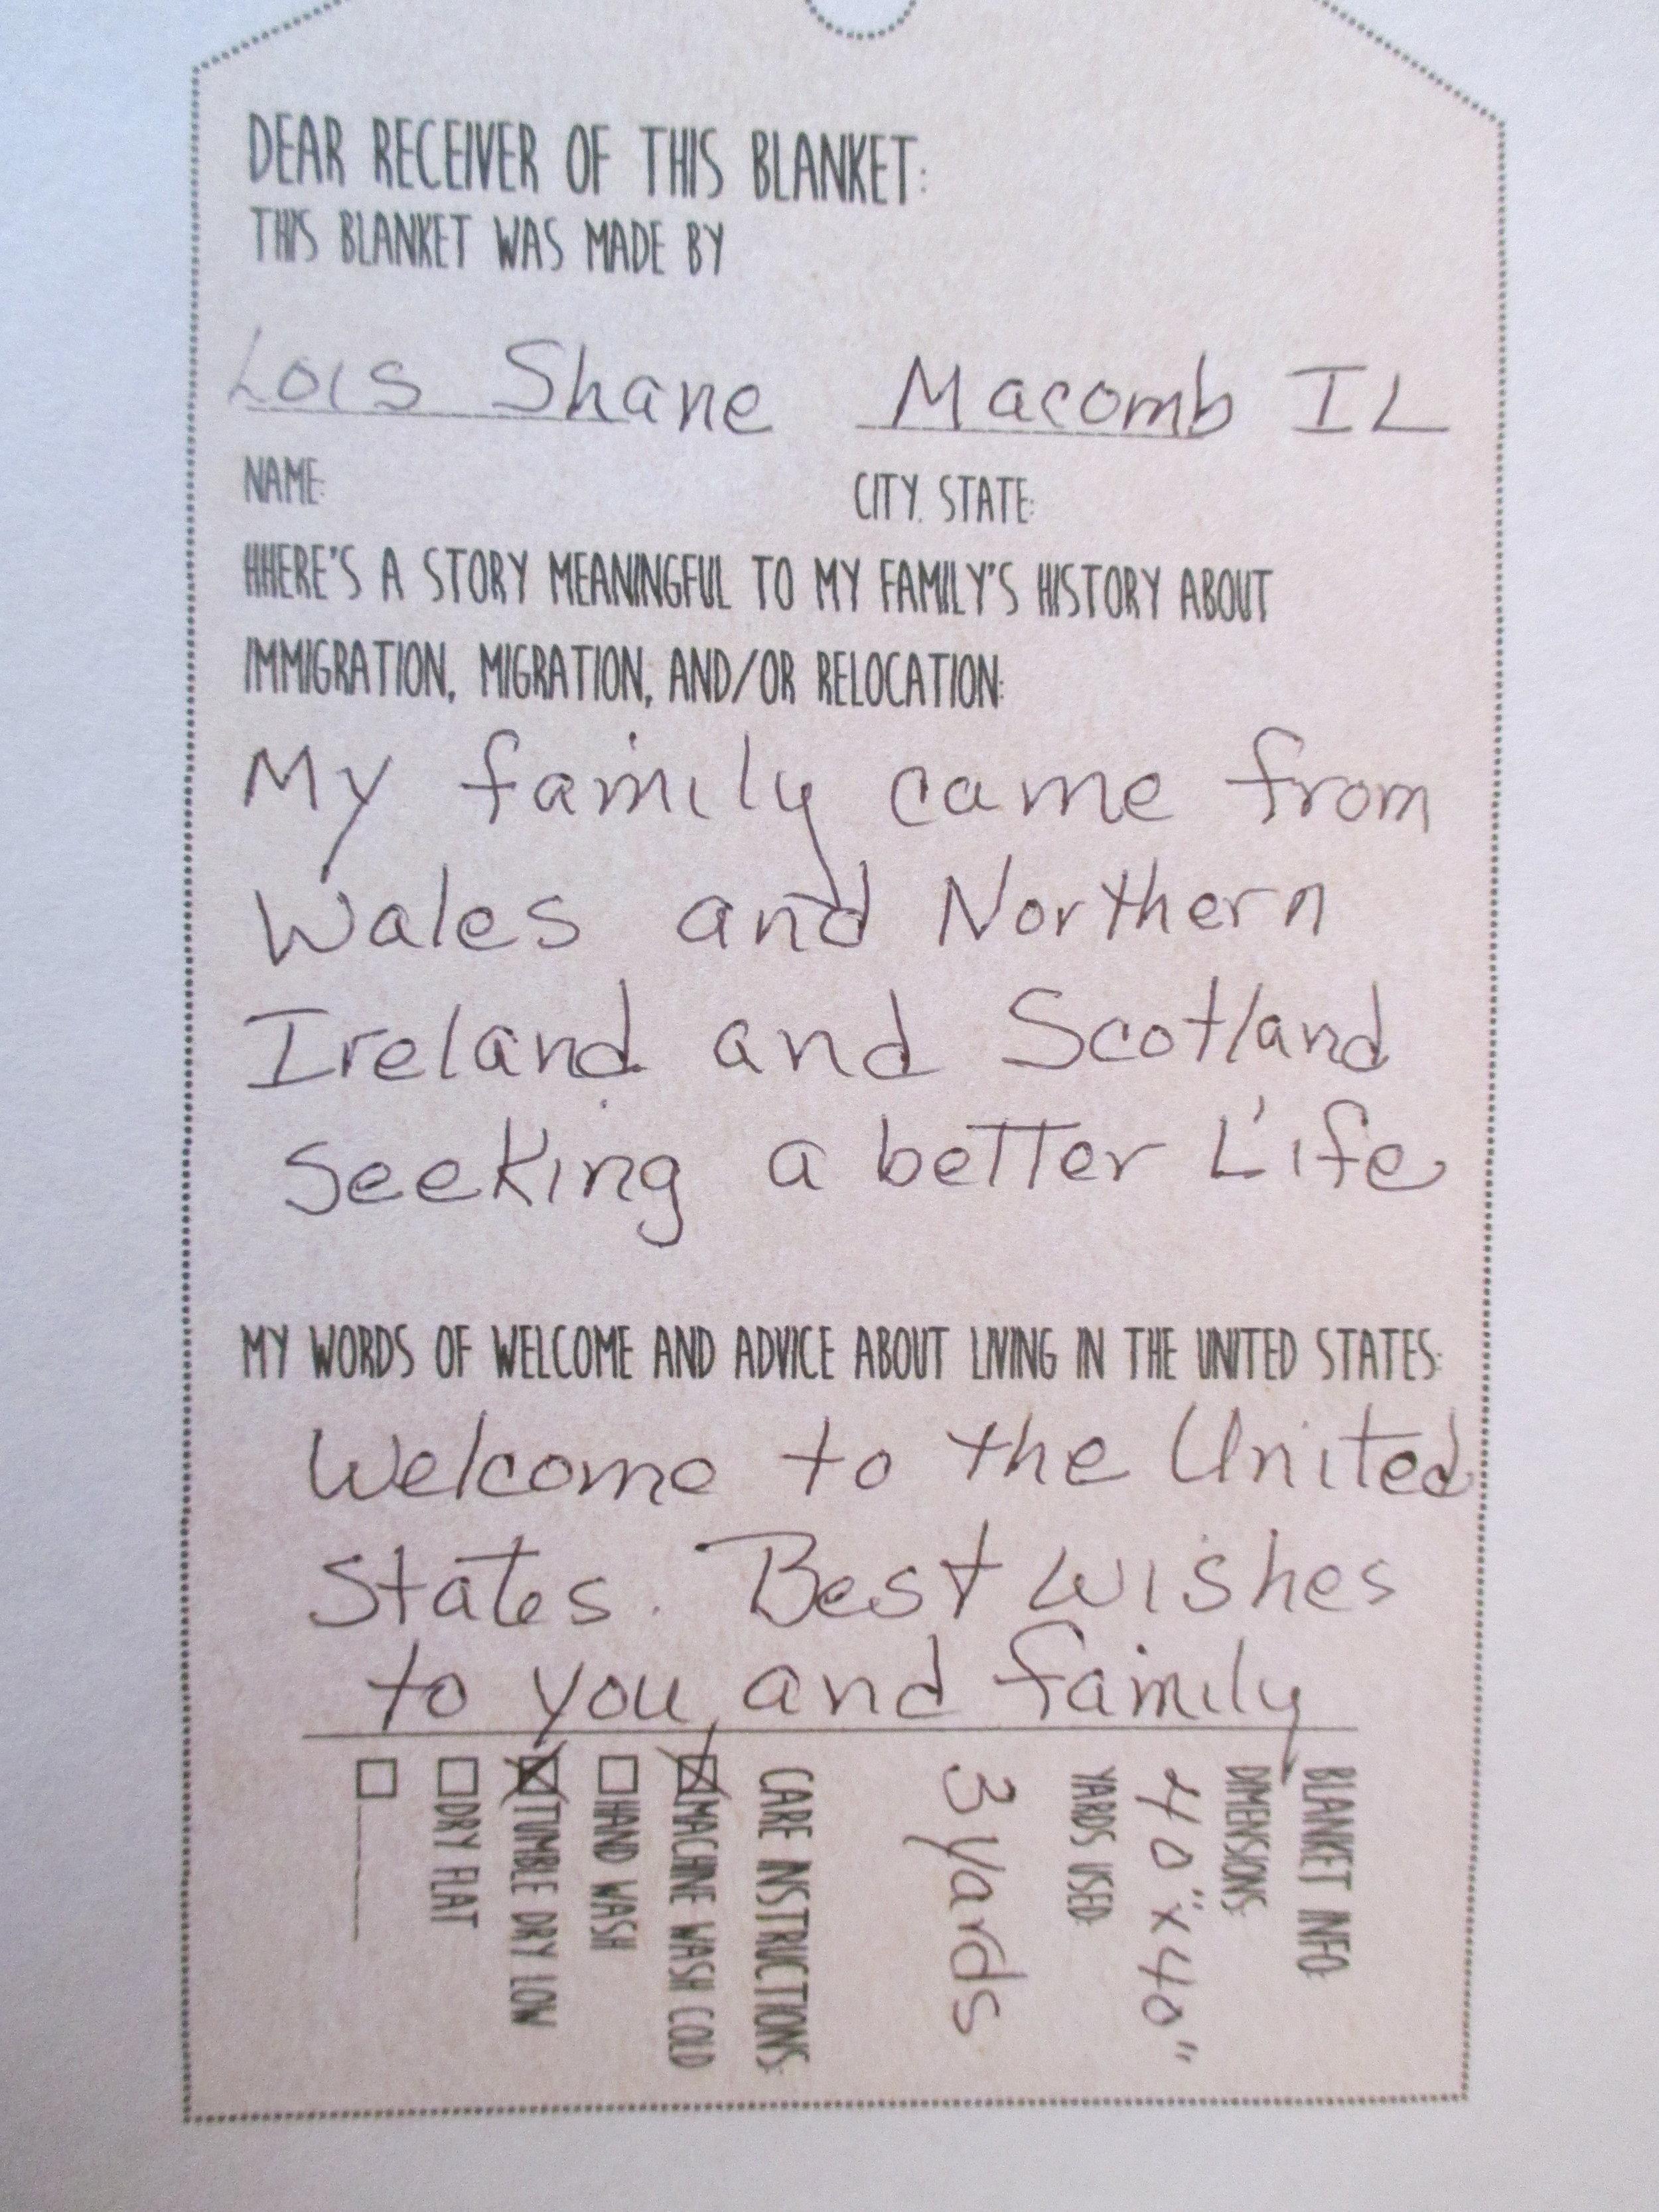 Lois Shane - Macomb, IL